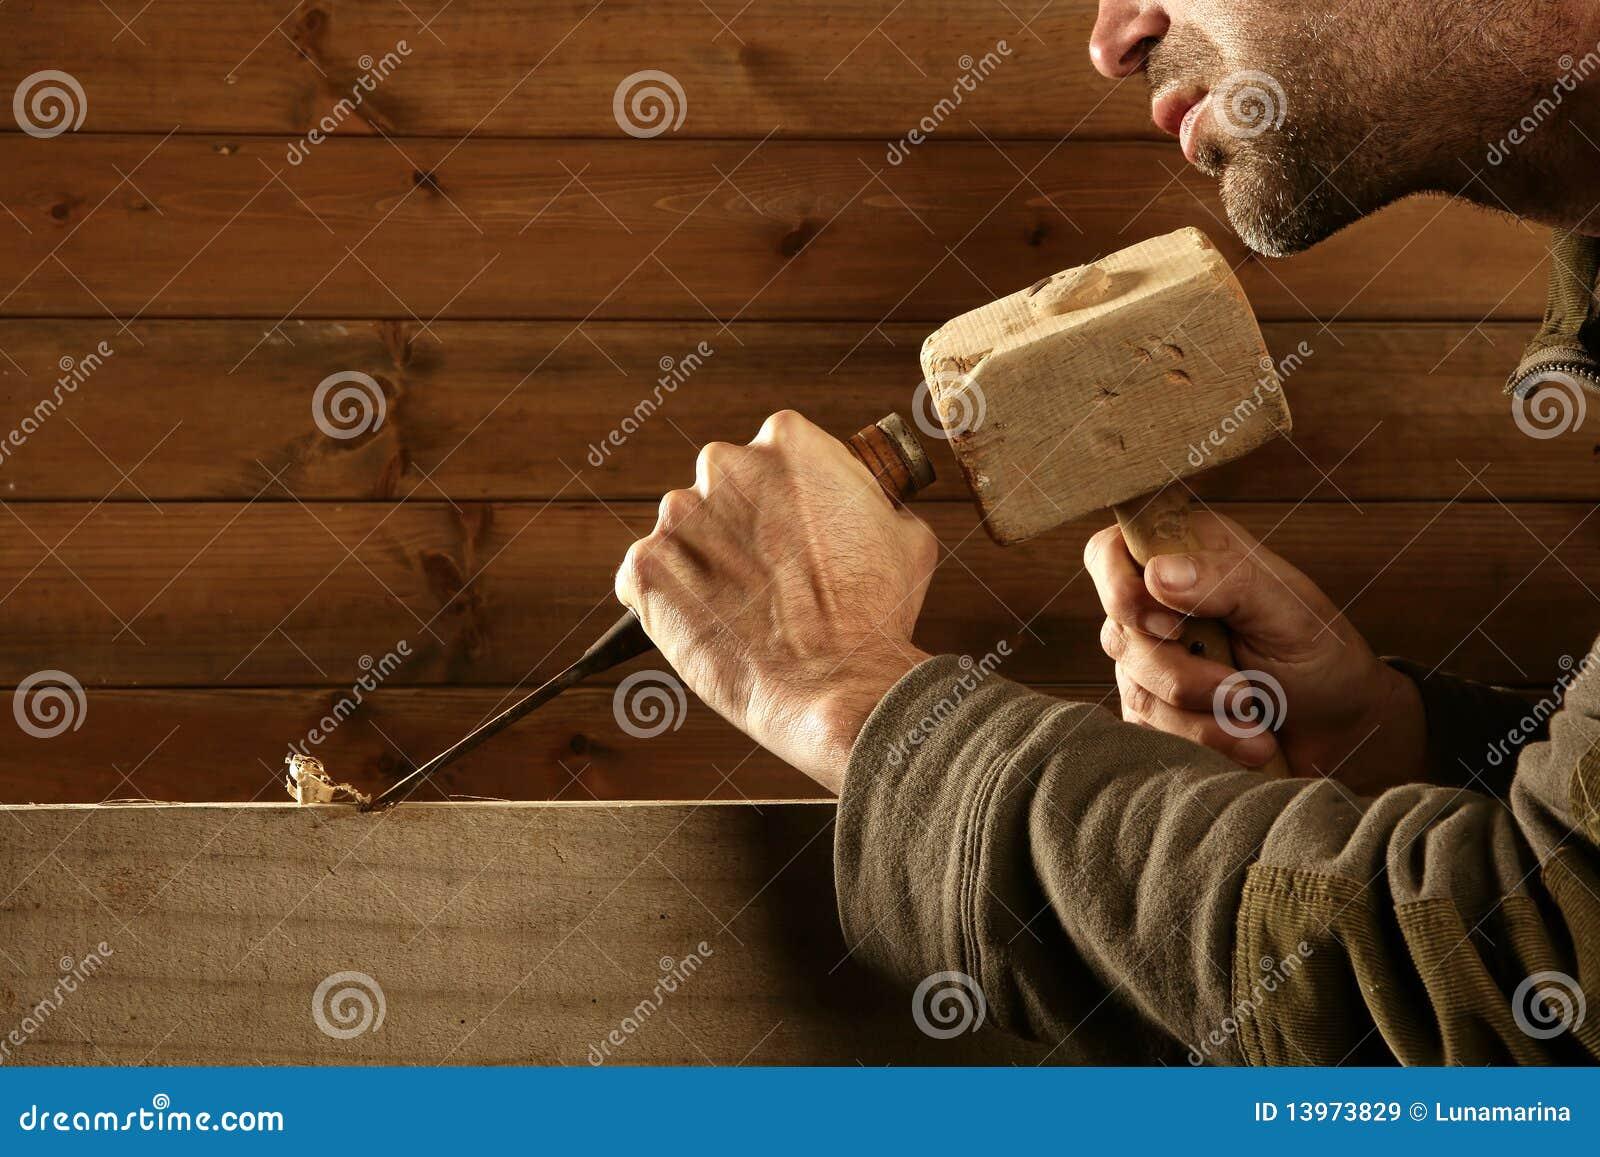 древесина ручного резца молотка gouge зубила плотника